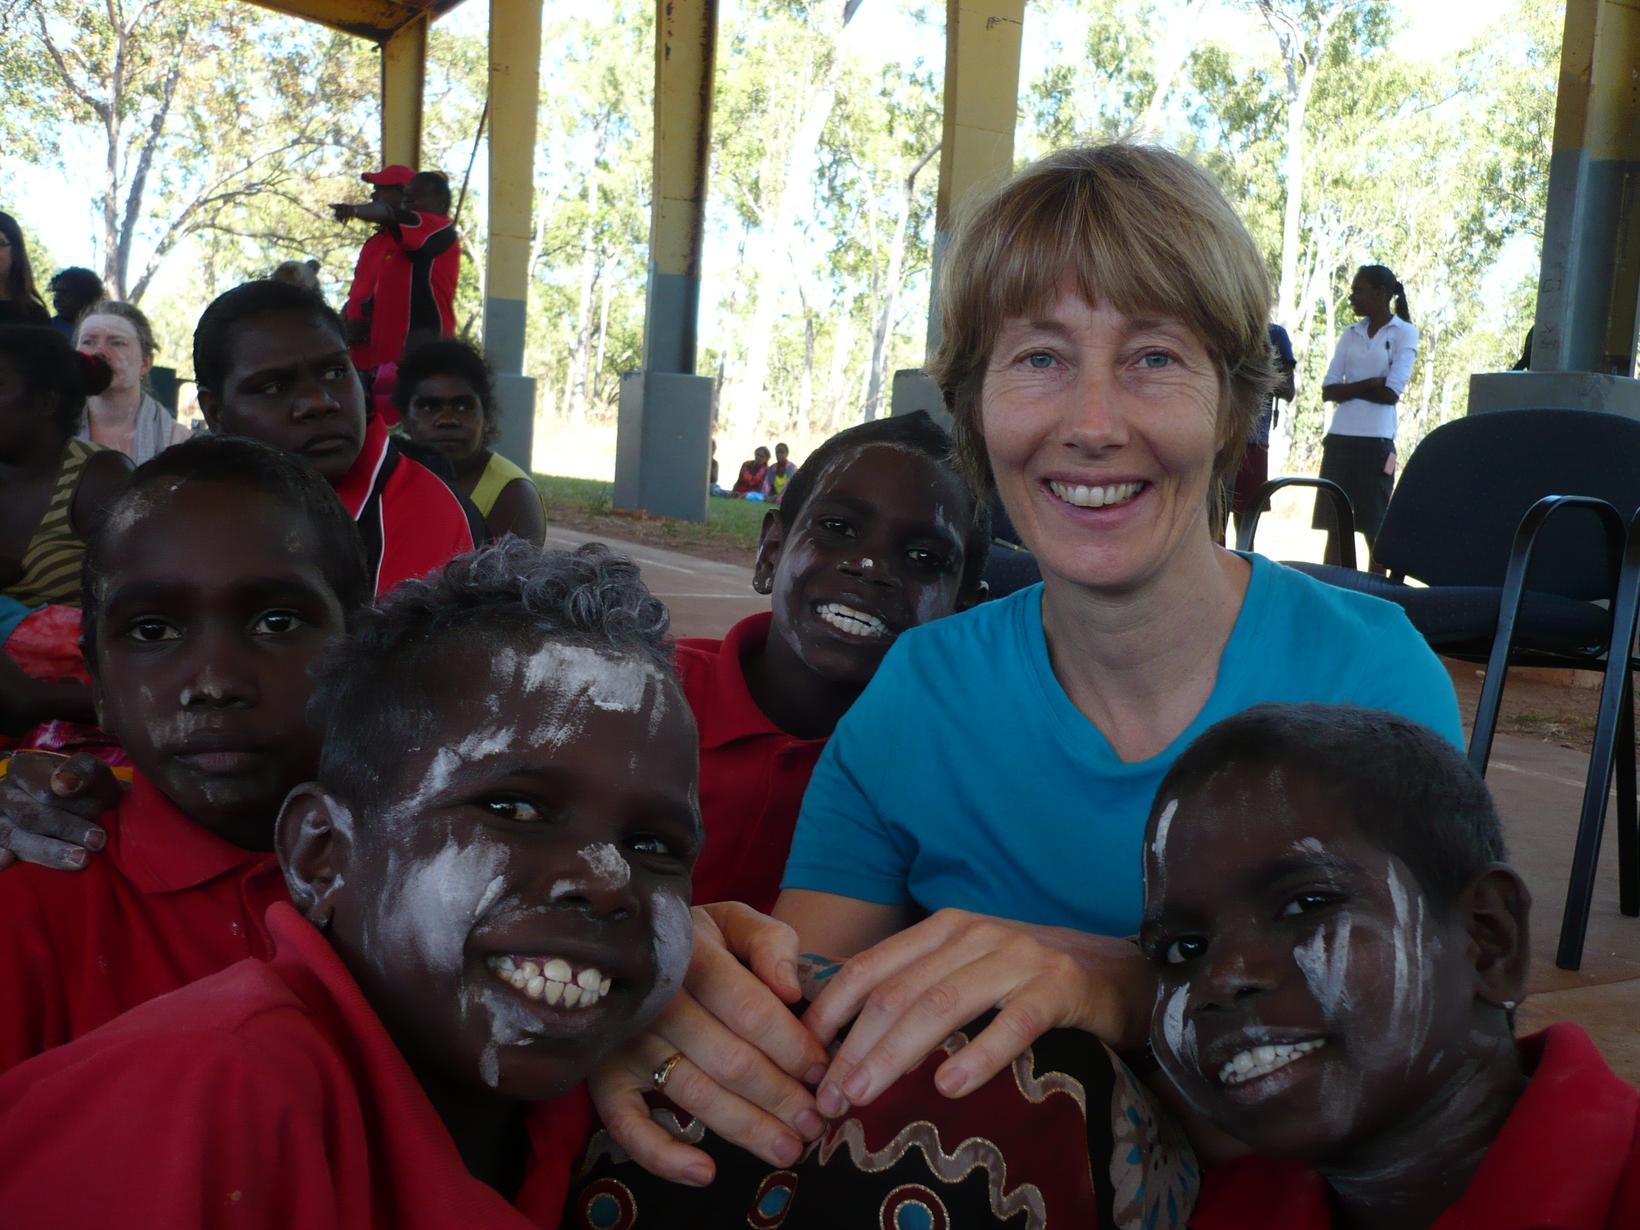 Paula from Bauple, Queensland, Australia